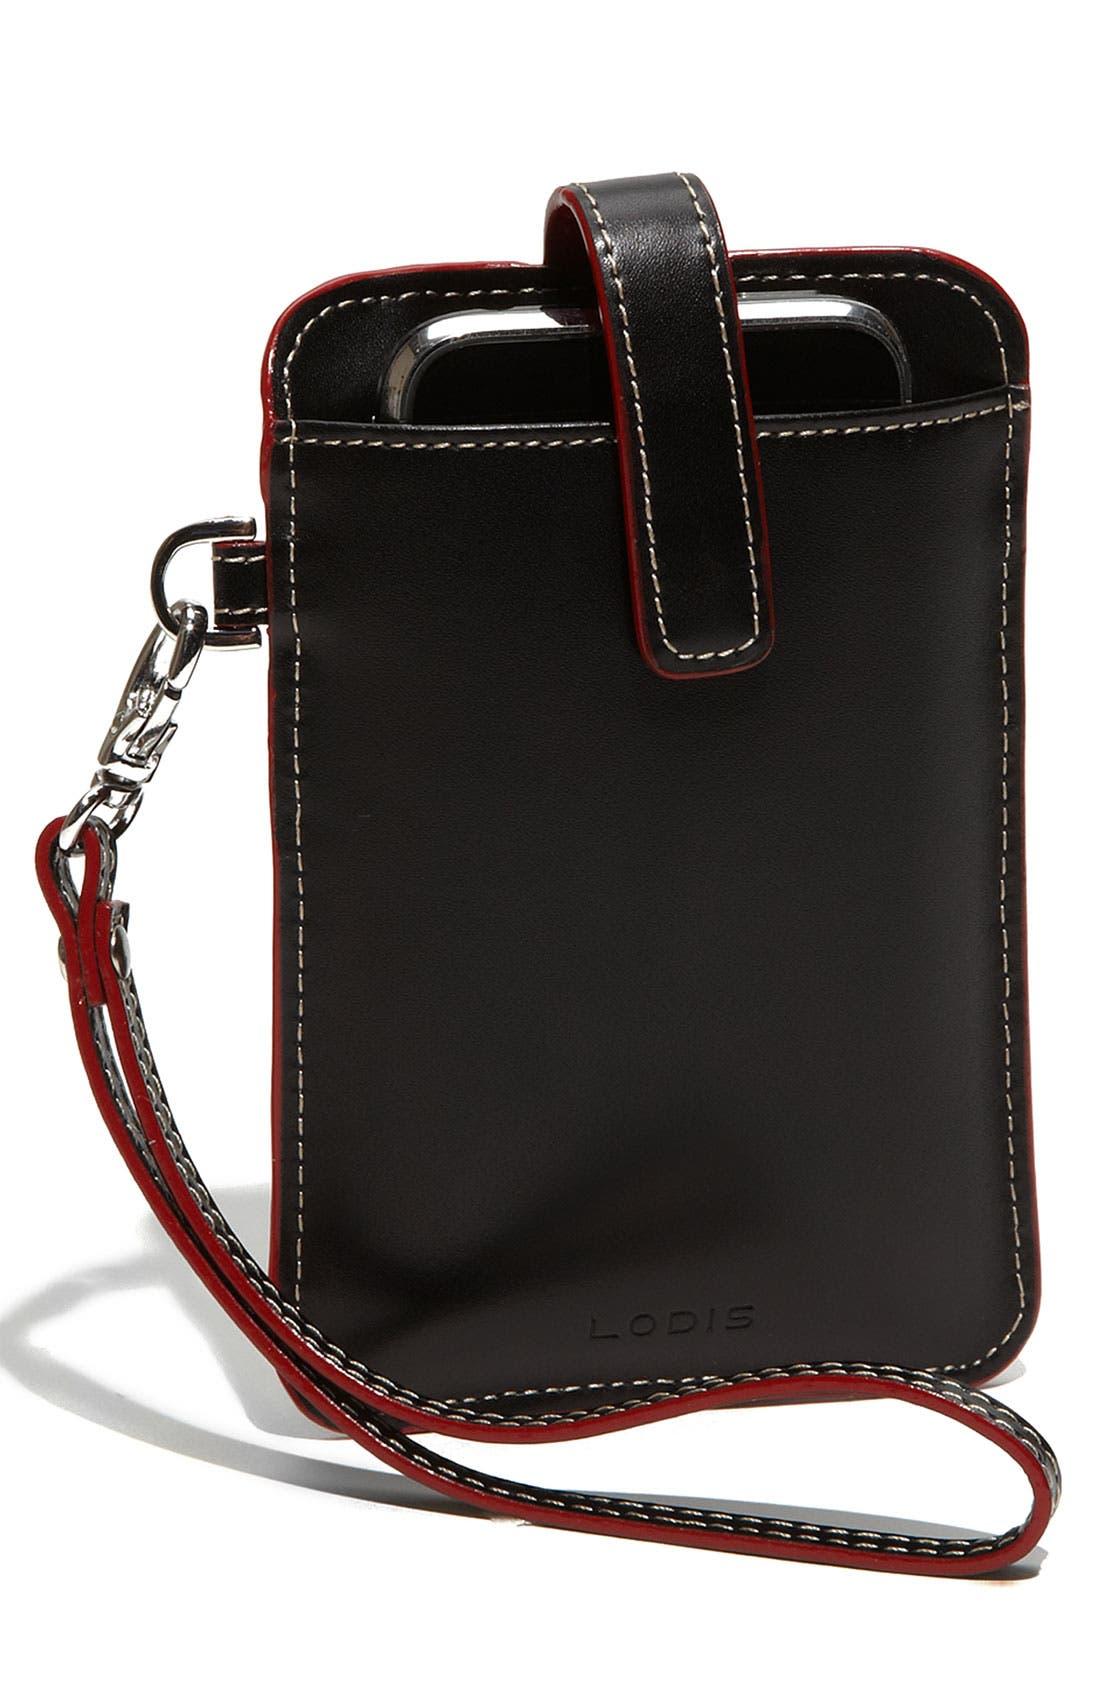 Main Image - Lodis 'Audrey' Smartphone Case